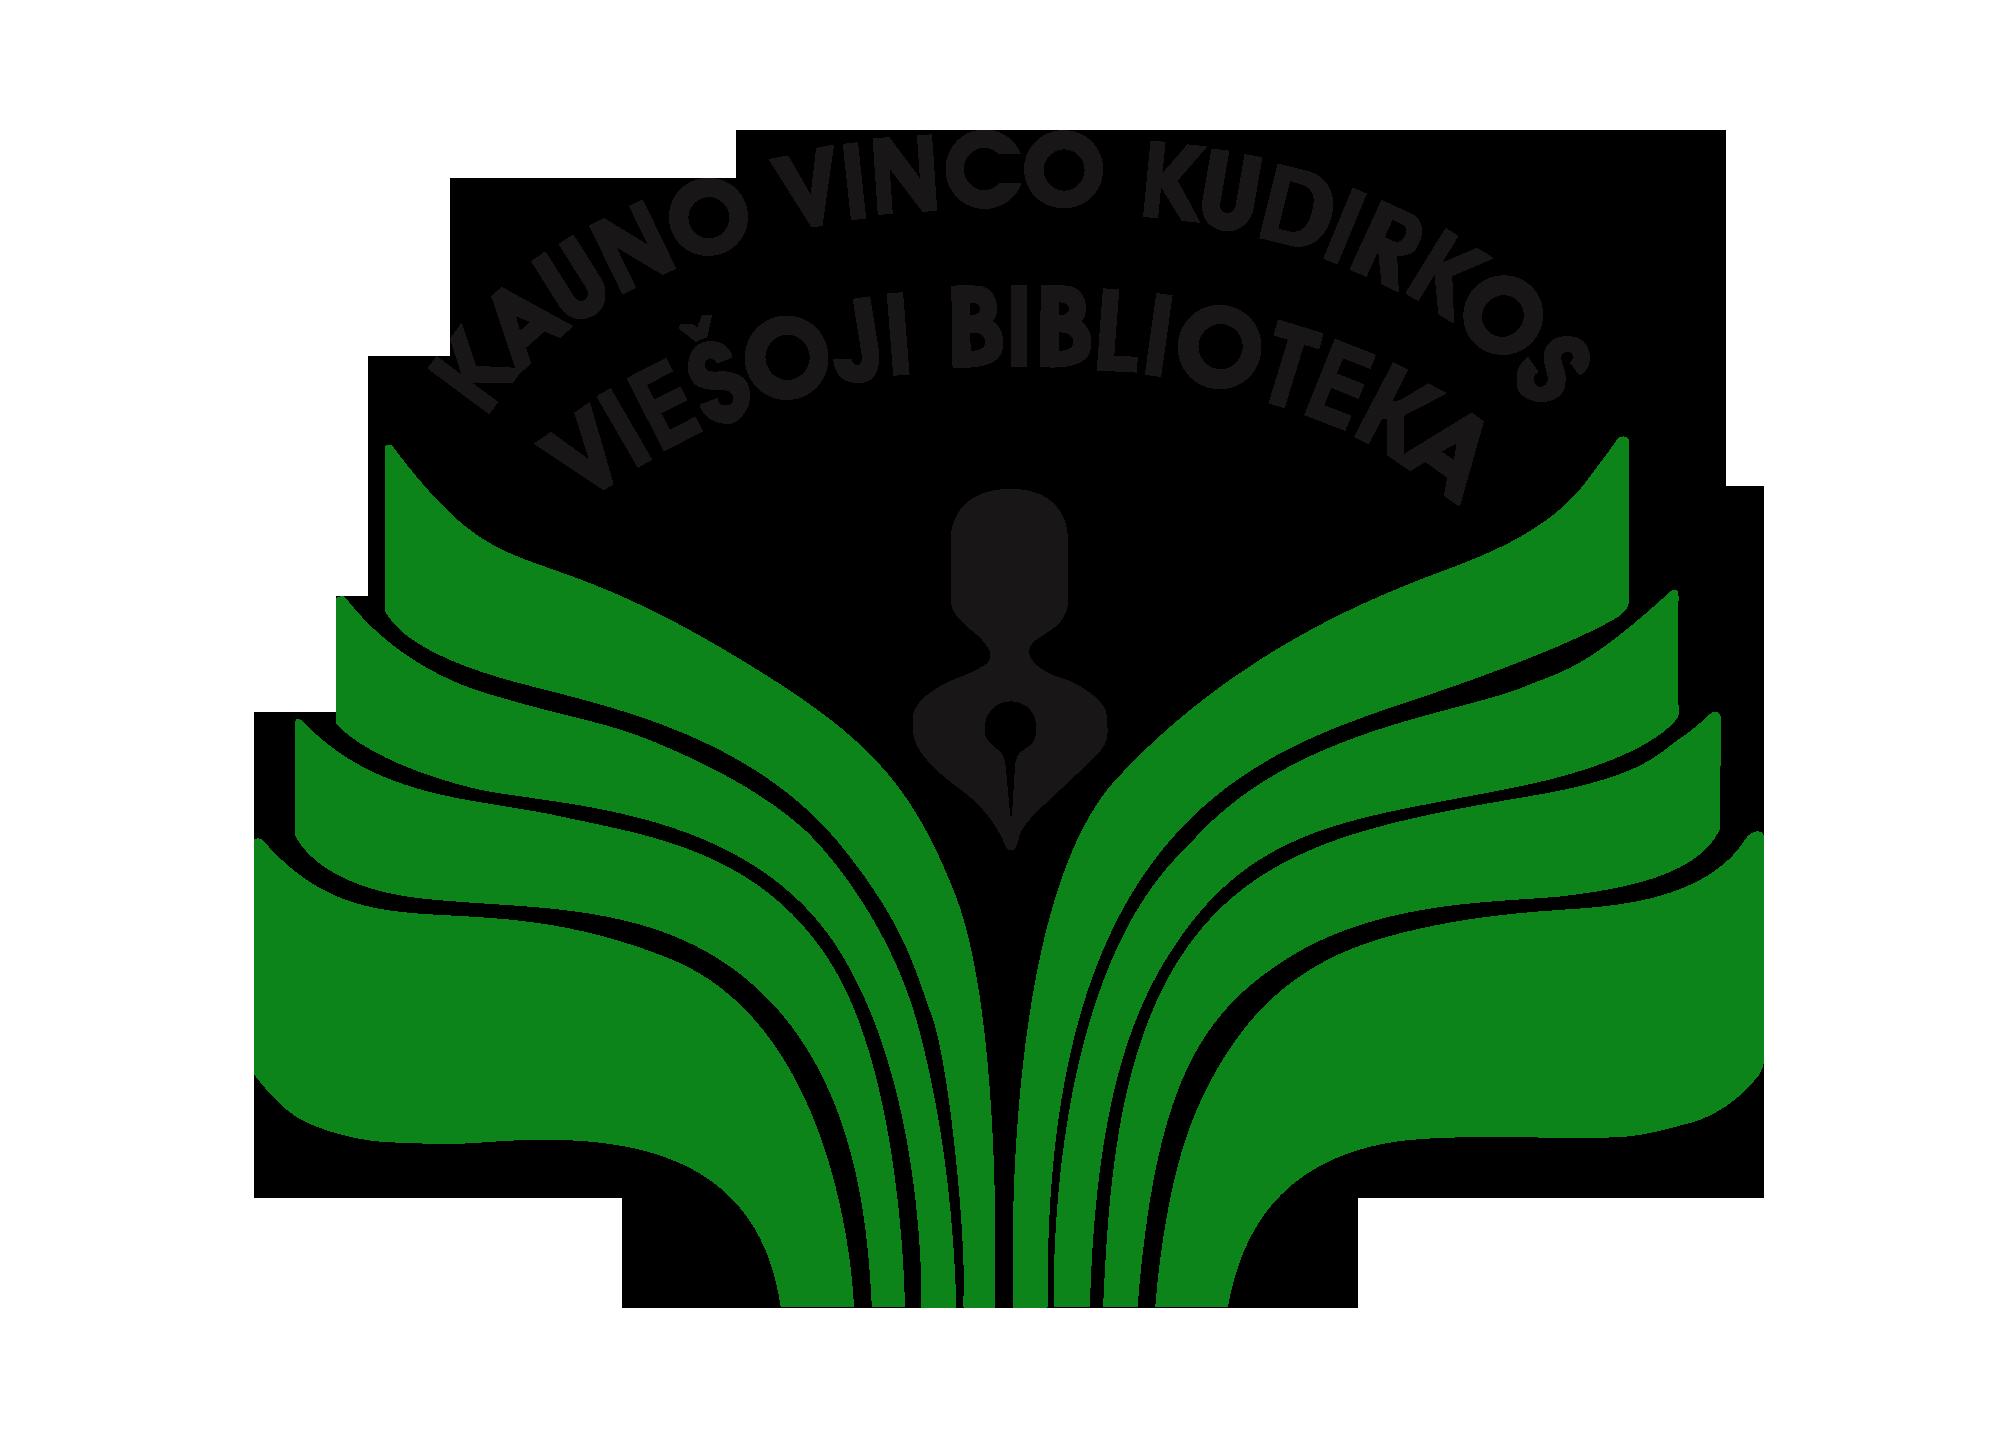 KaunasLibrary